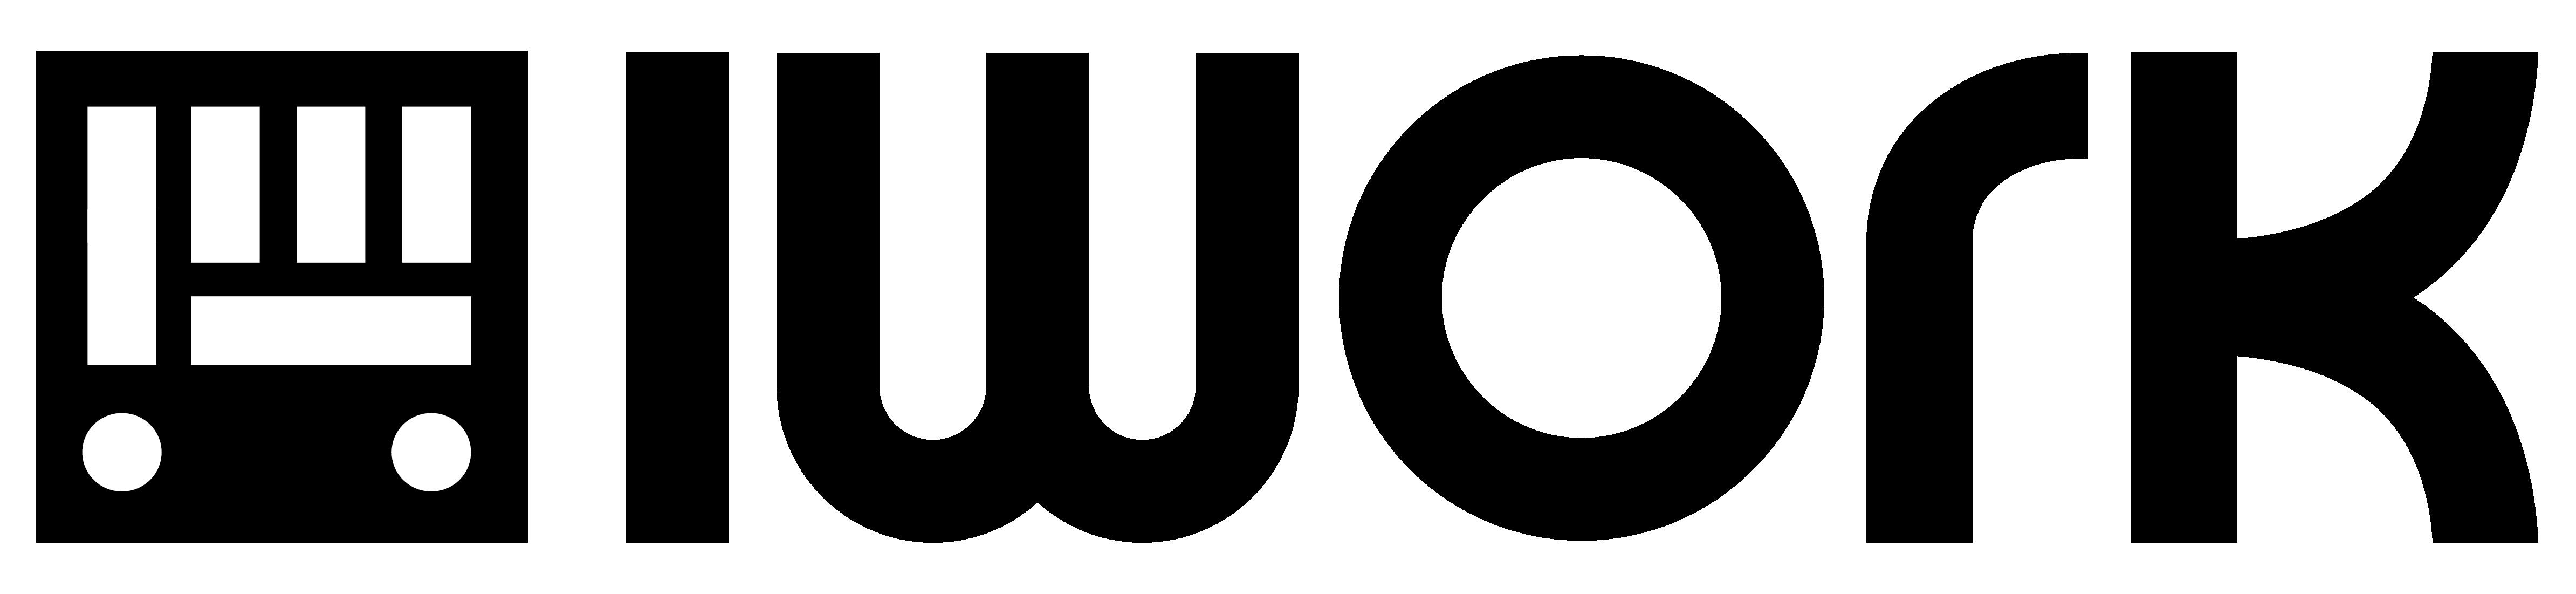 東京荒川区|交通広告の印刷会社|アイ・ワーク株式会社|iwork.co.jp